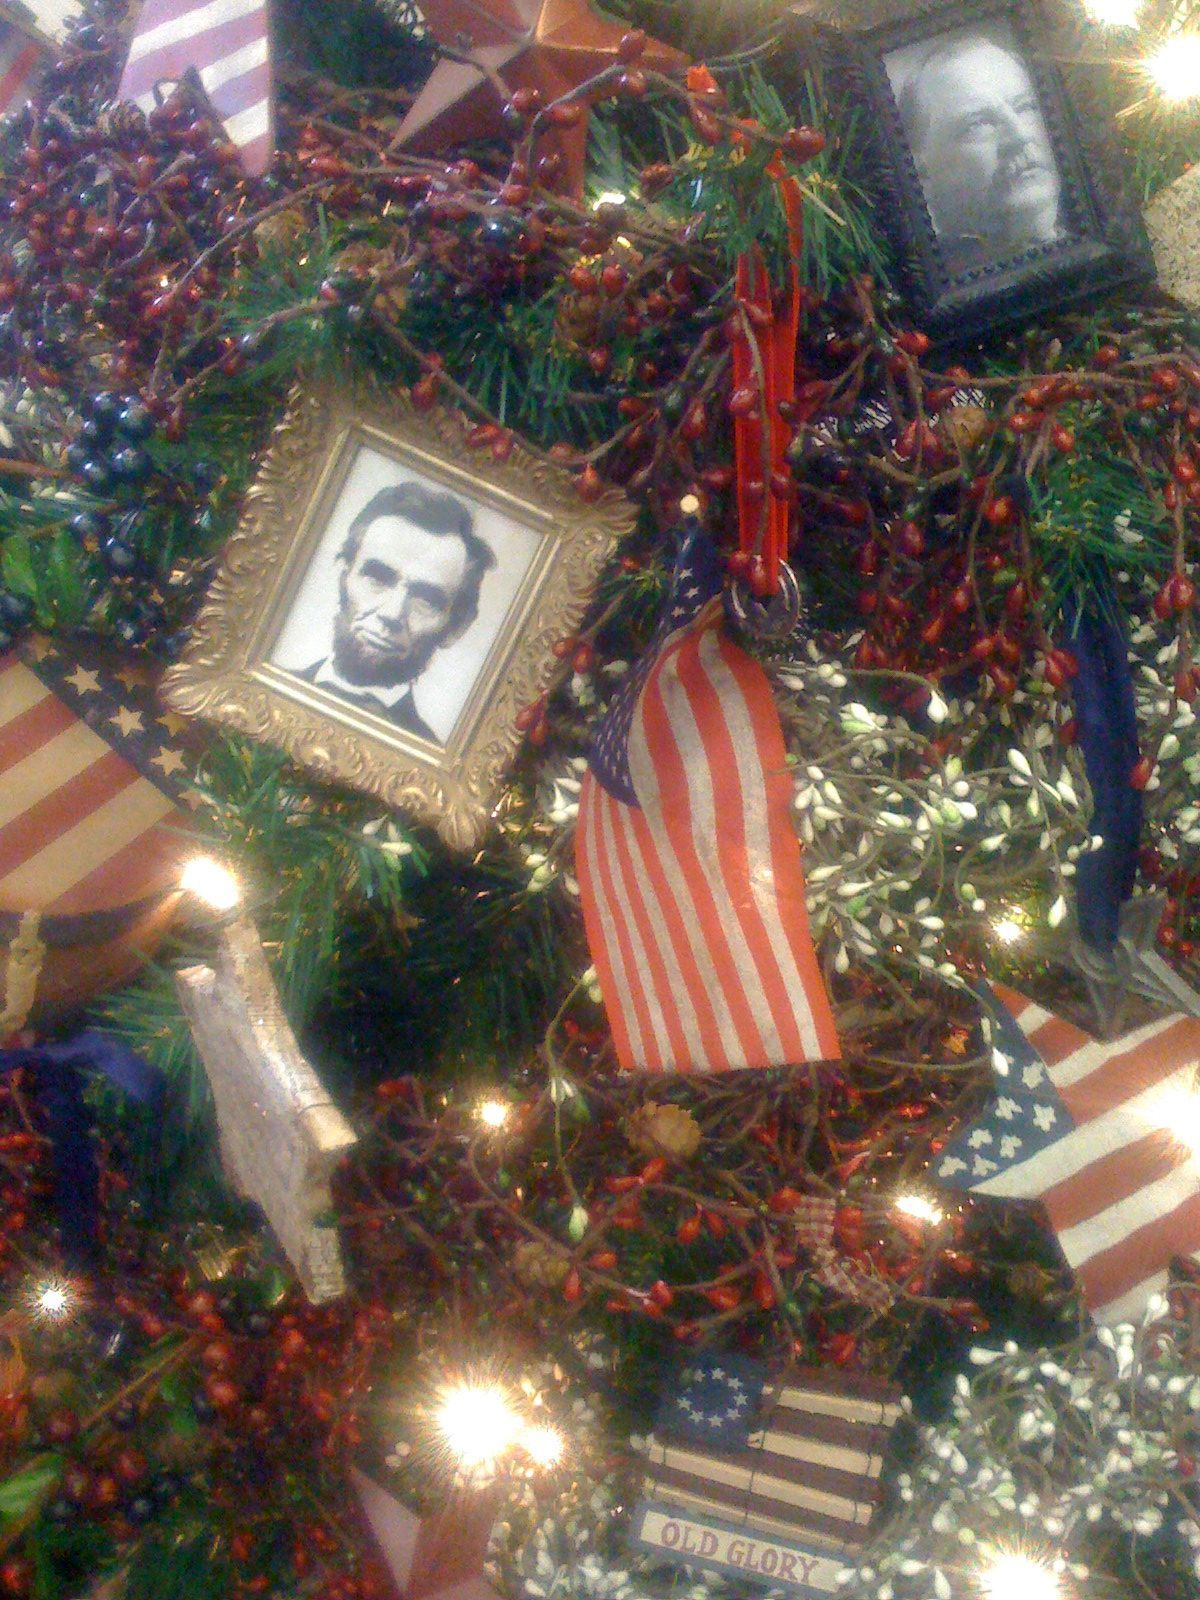 An Americana Christmas Tree Patriotic Christmas Tree Patriotic Christmas Patriotic Christmas Decorations